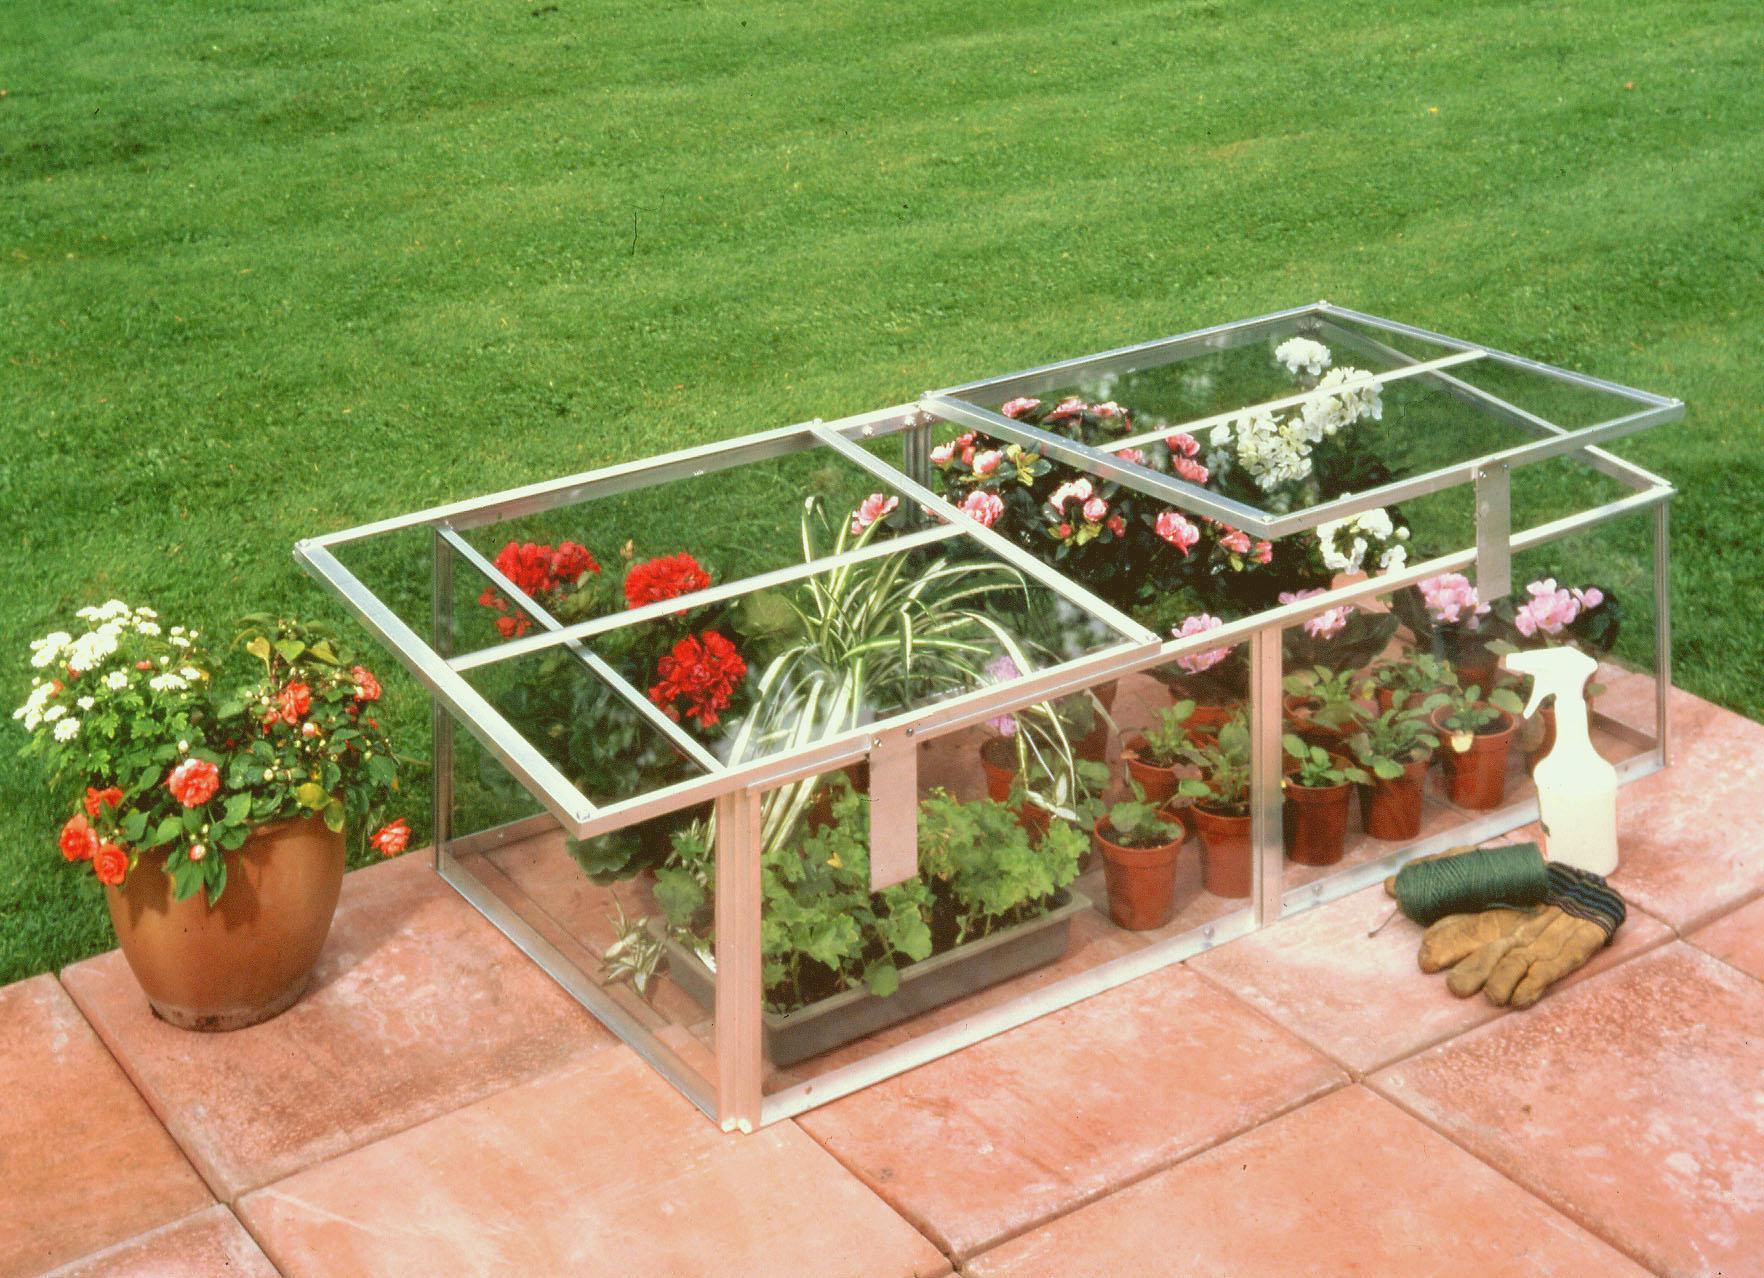 Silver Aluminium Cold Frame 4x2 Horticultural Glass